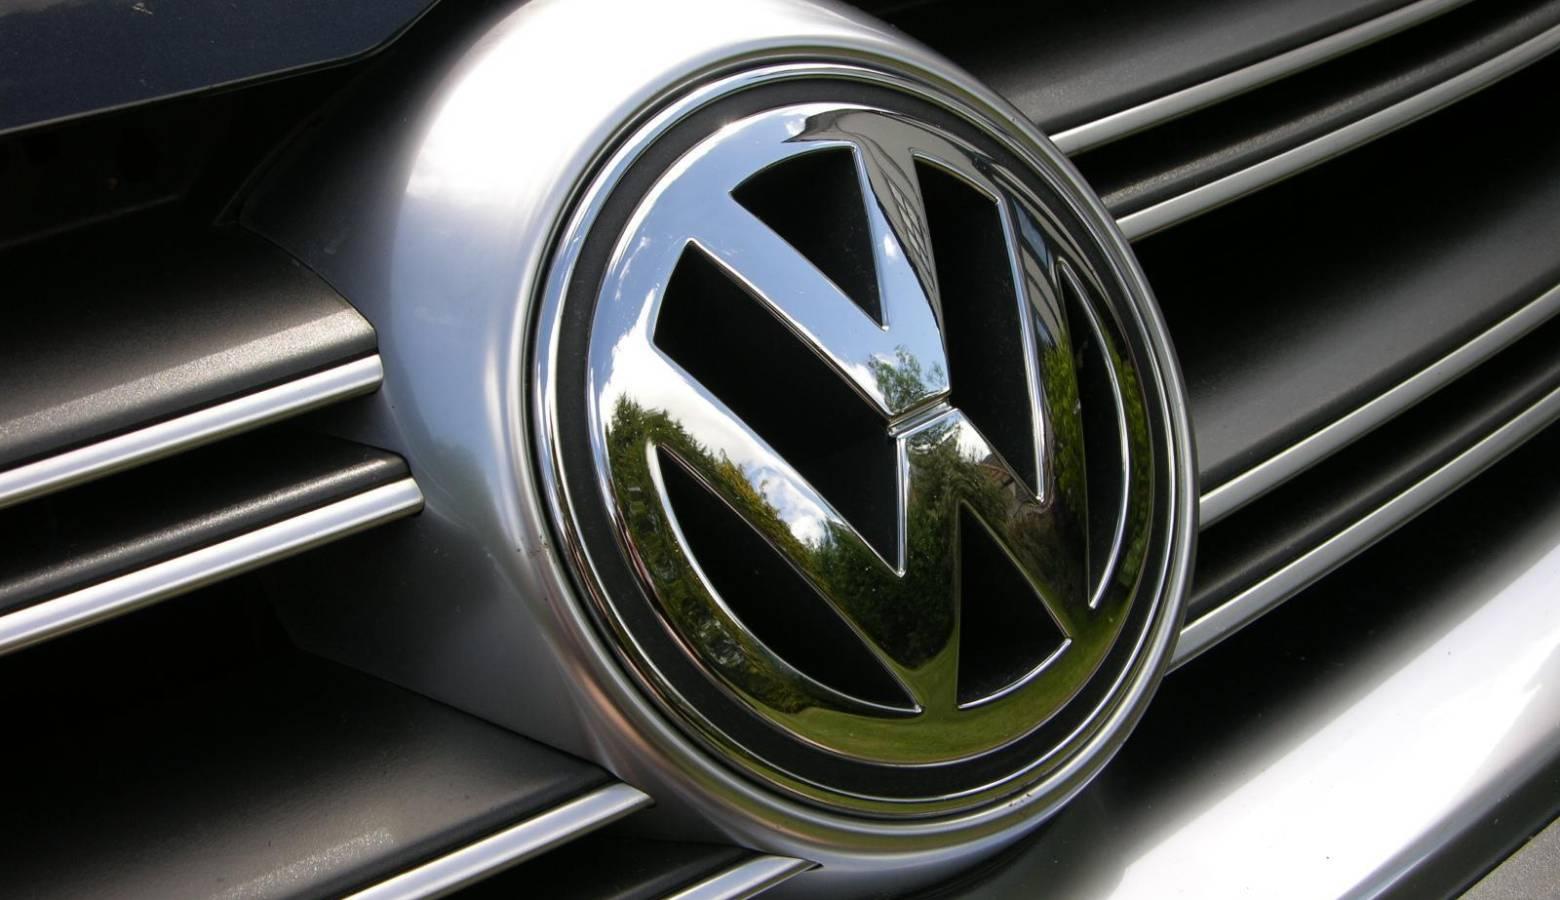 2007 Volkswagen Golf (The Car Spy/Wikimedia Commons)